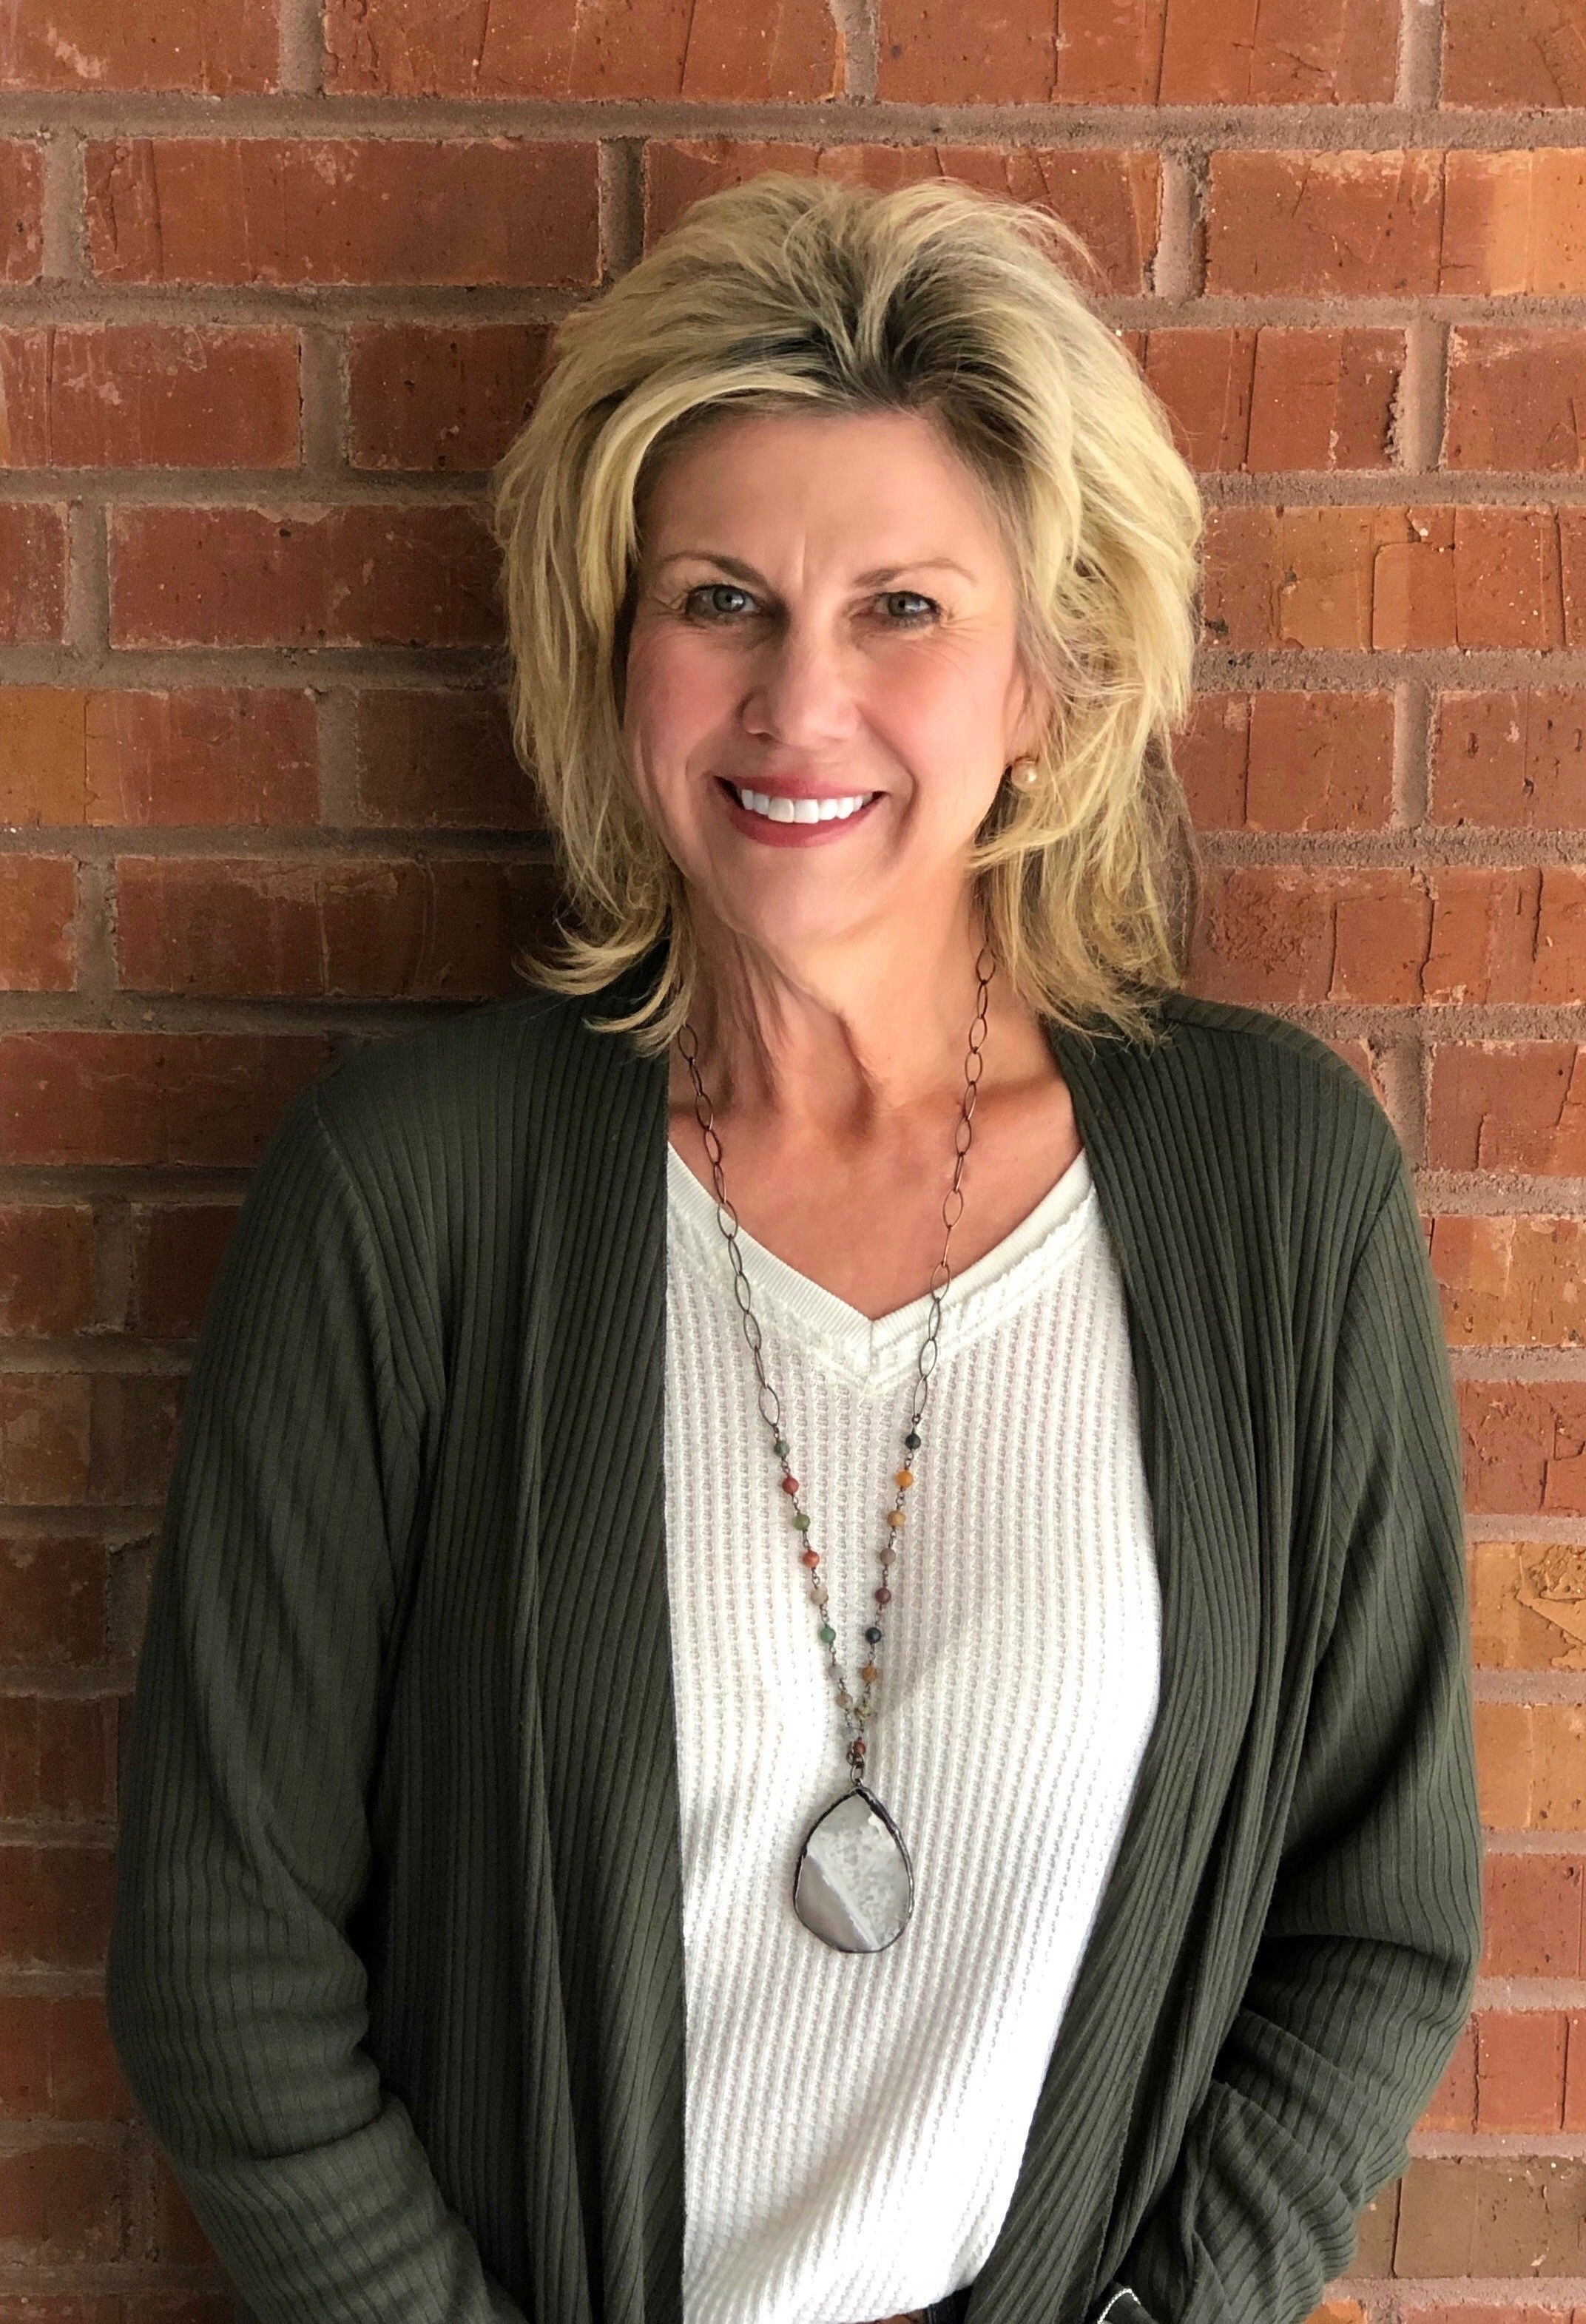 Jo Beth Swengel, Community Engagement Specialist